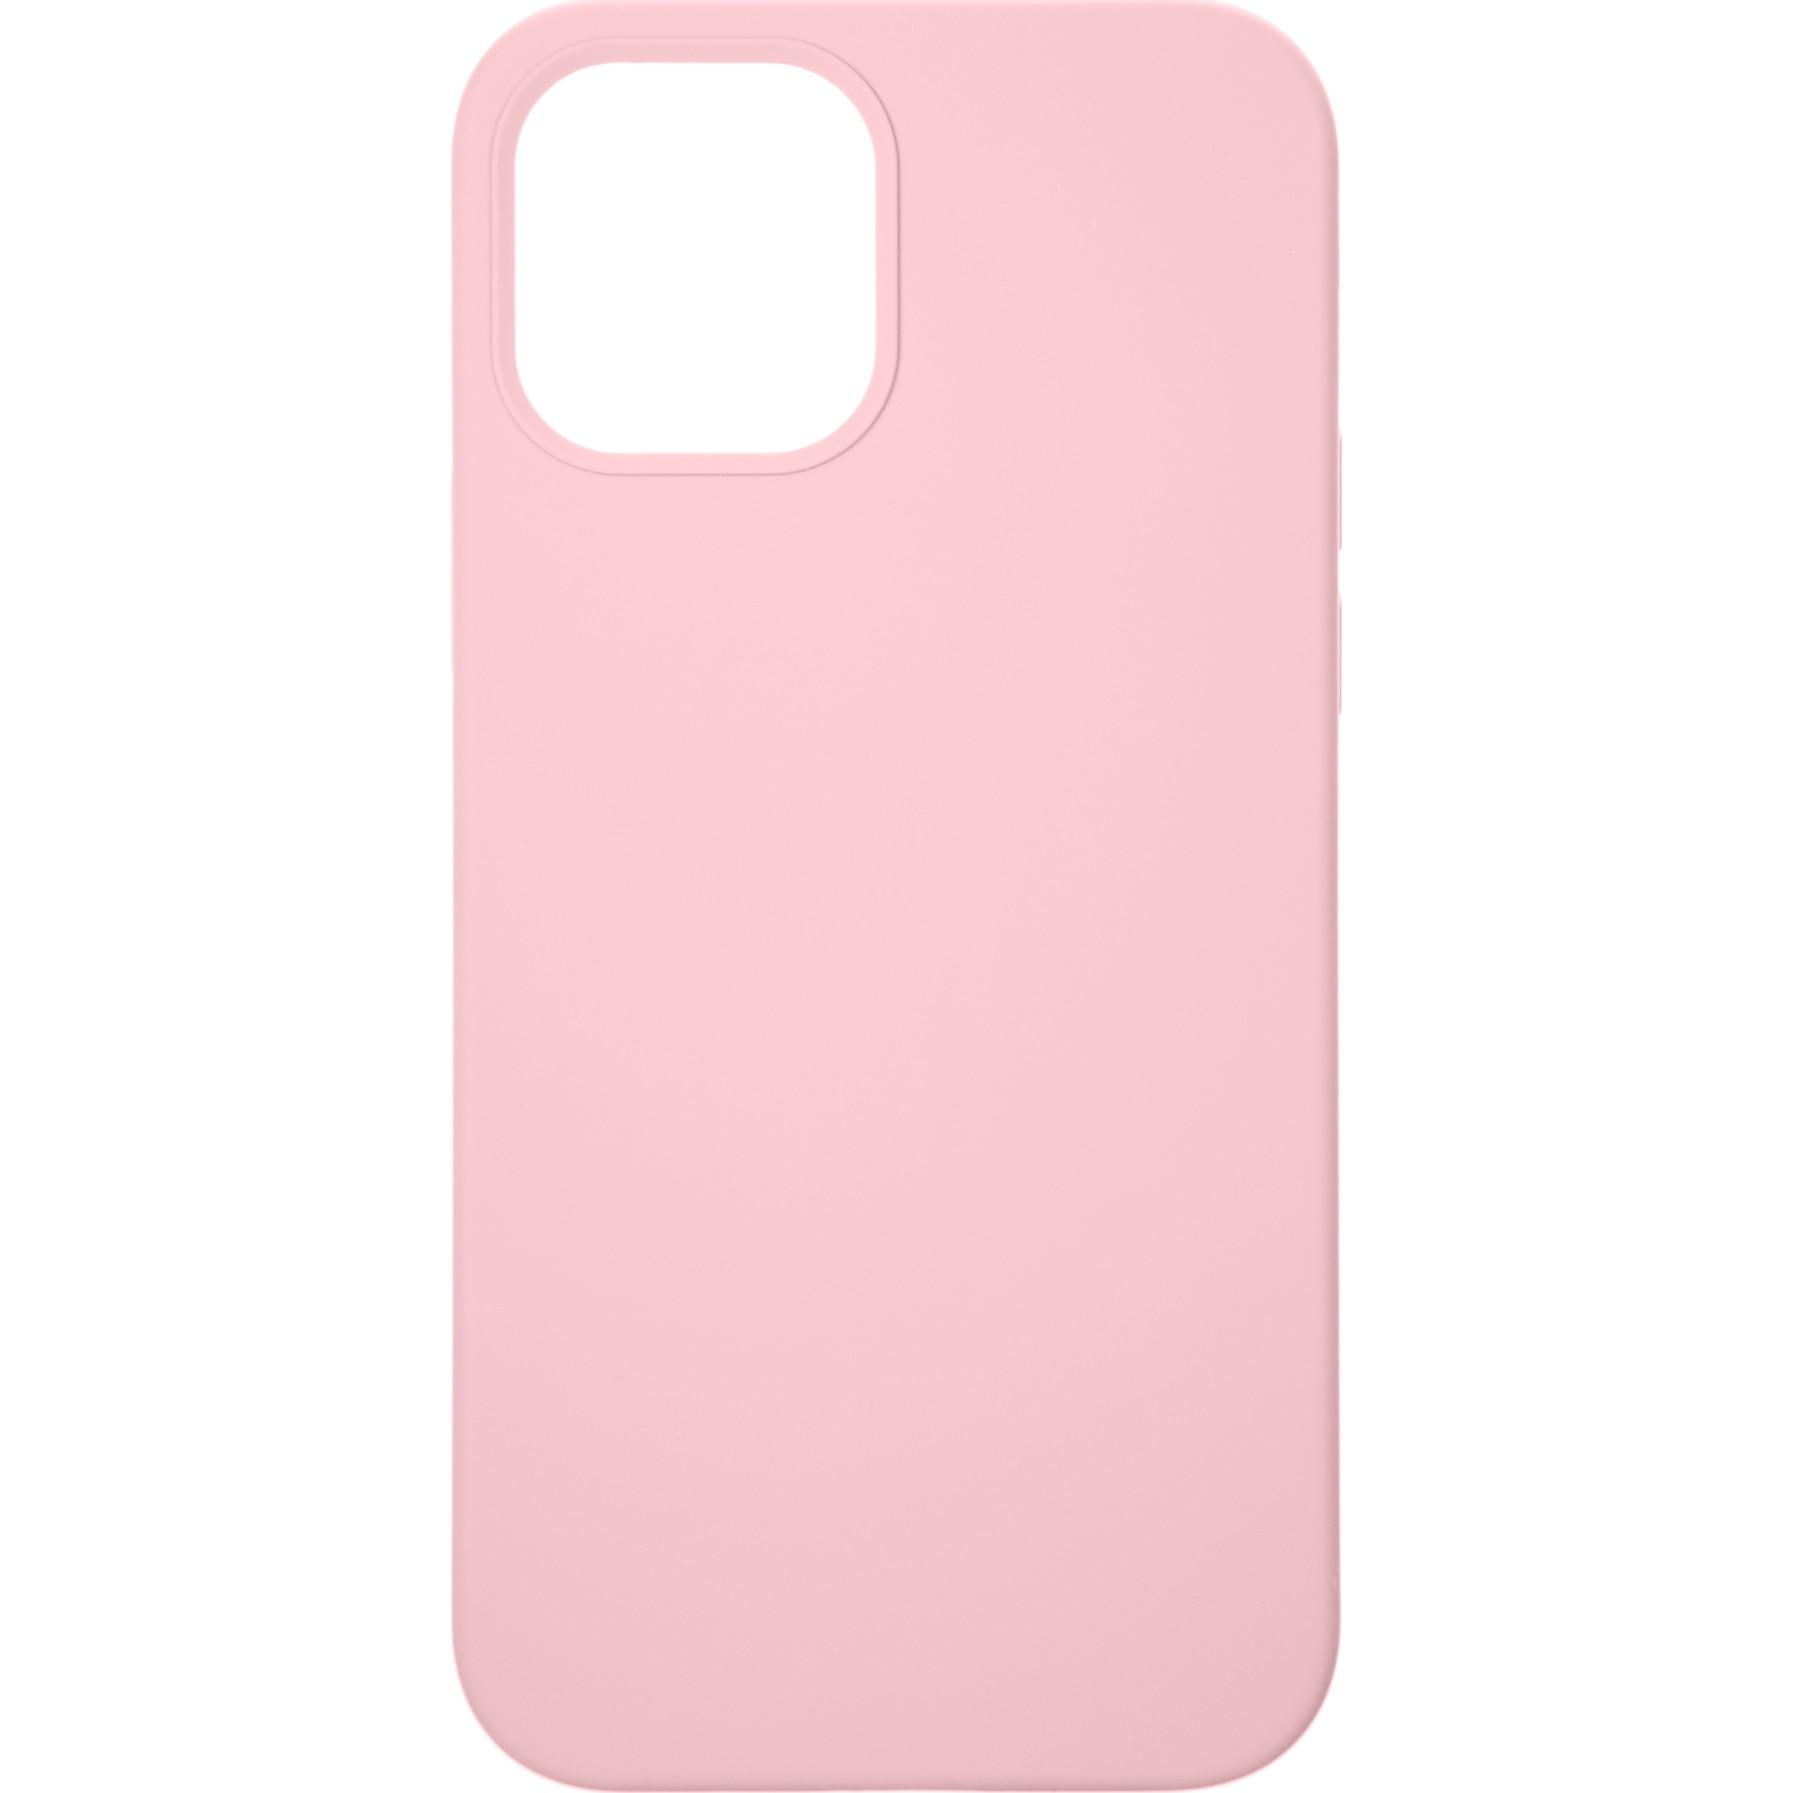 Fotografie Husa de protectie Tactical Velvet Smoothie pentru iPhone 12/12 Pro Pink Panther